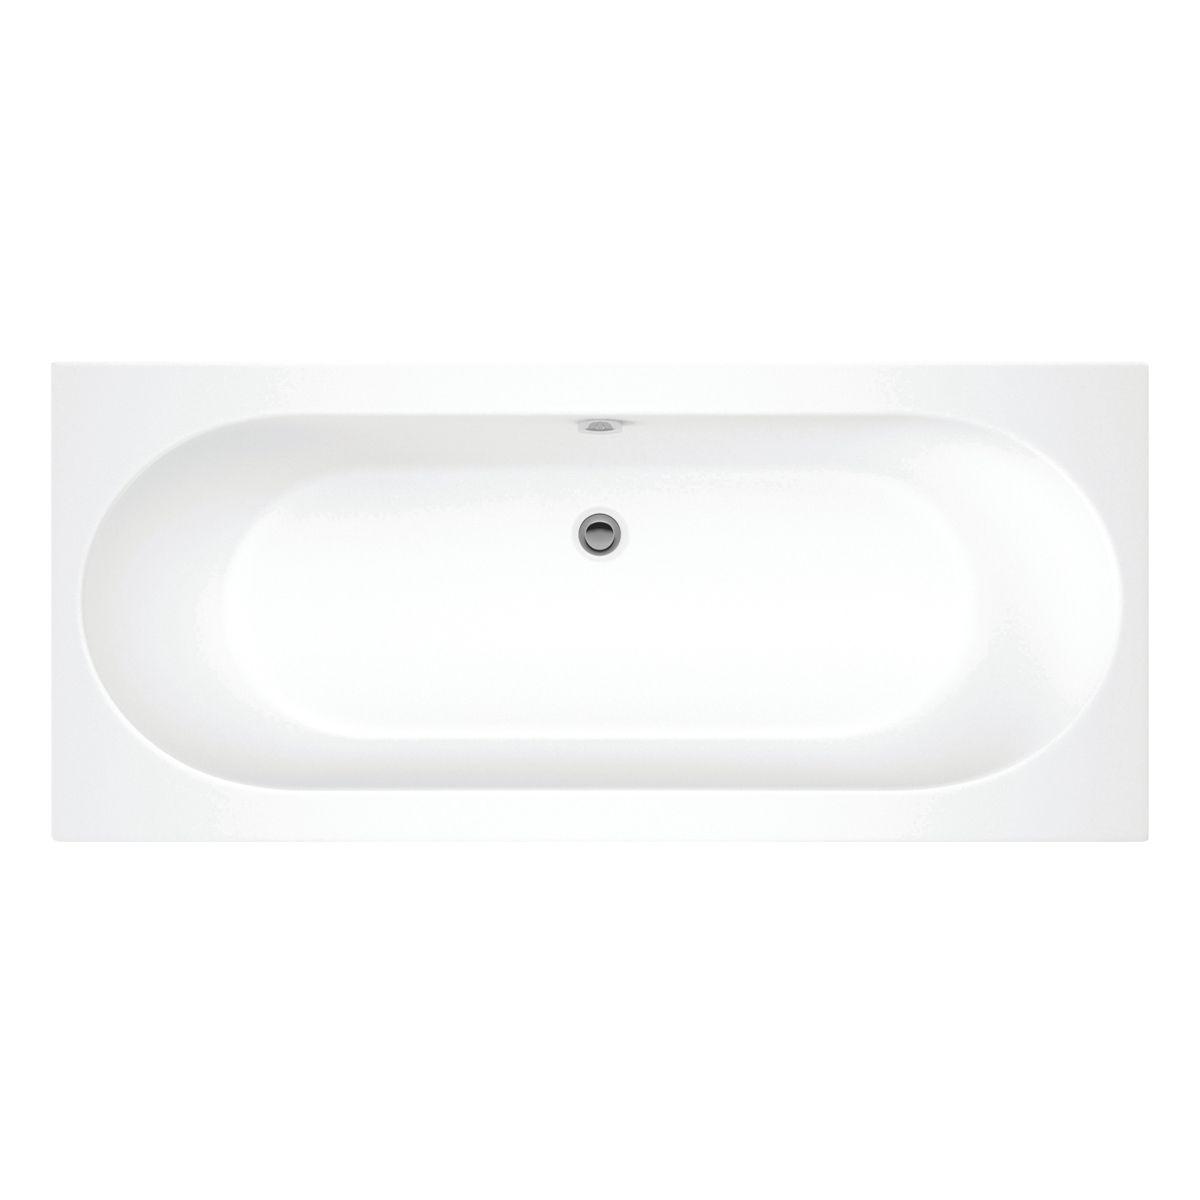 Moods Cascade Supercast Double Ended Whirlpool Bath 1800mm